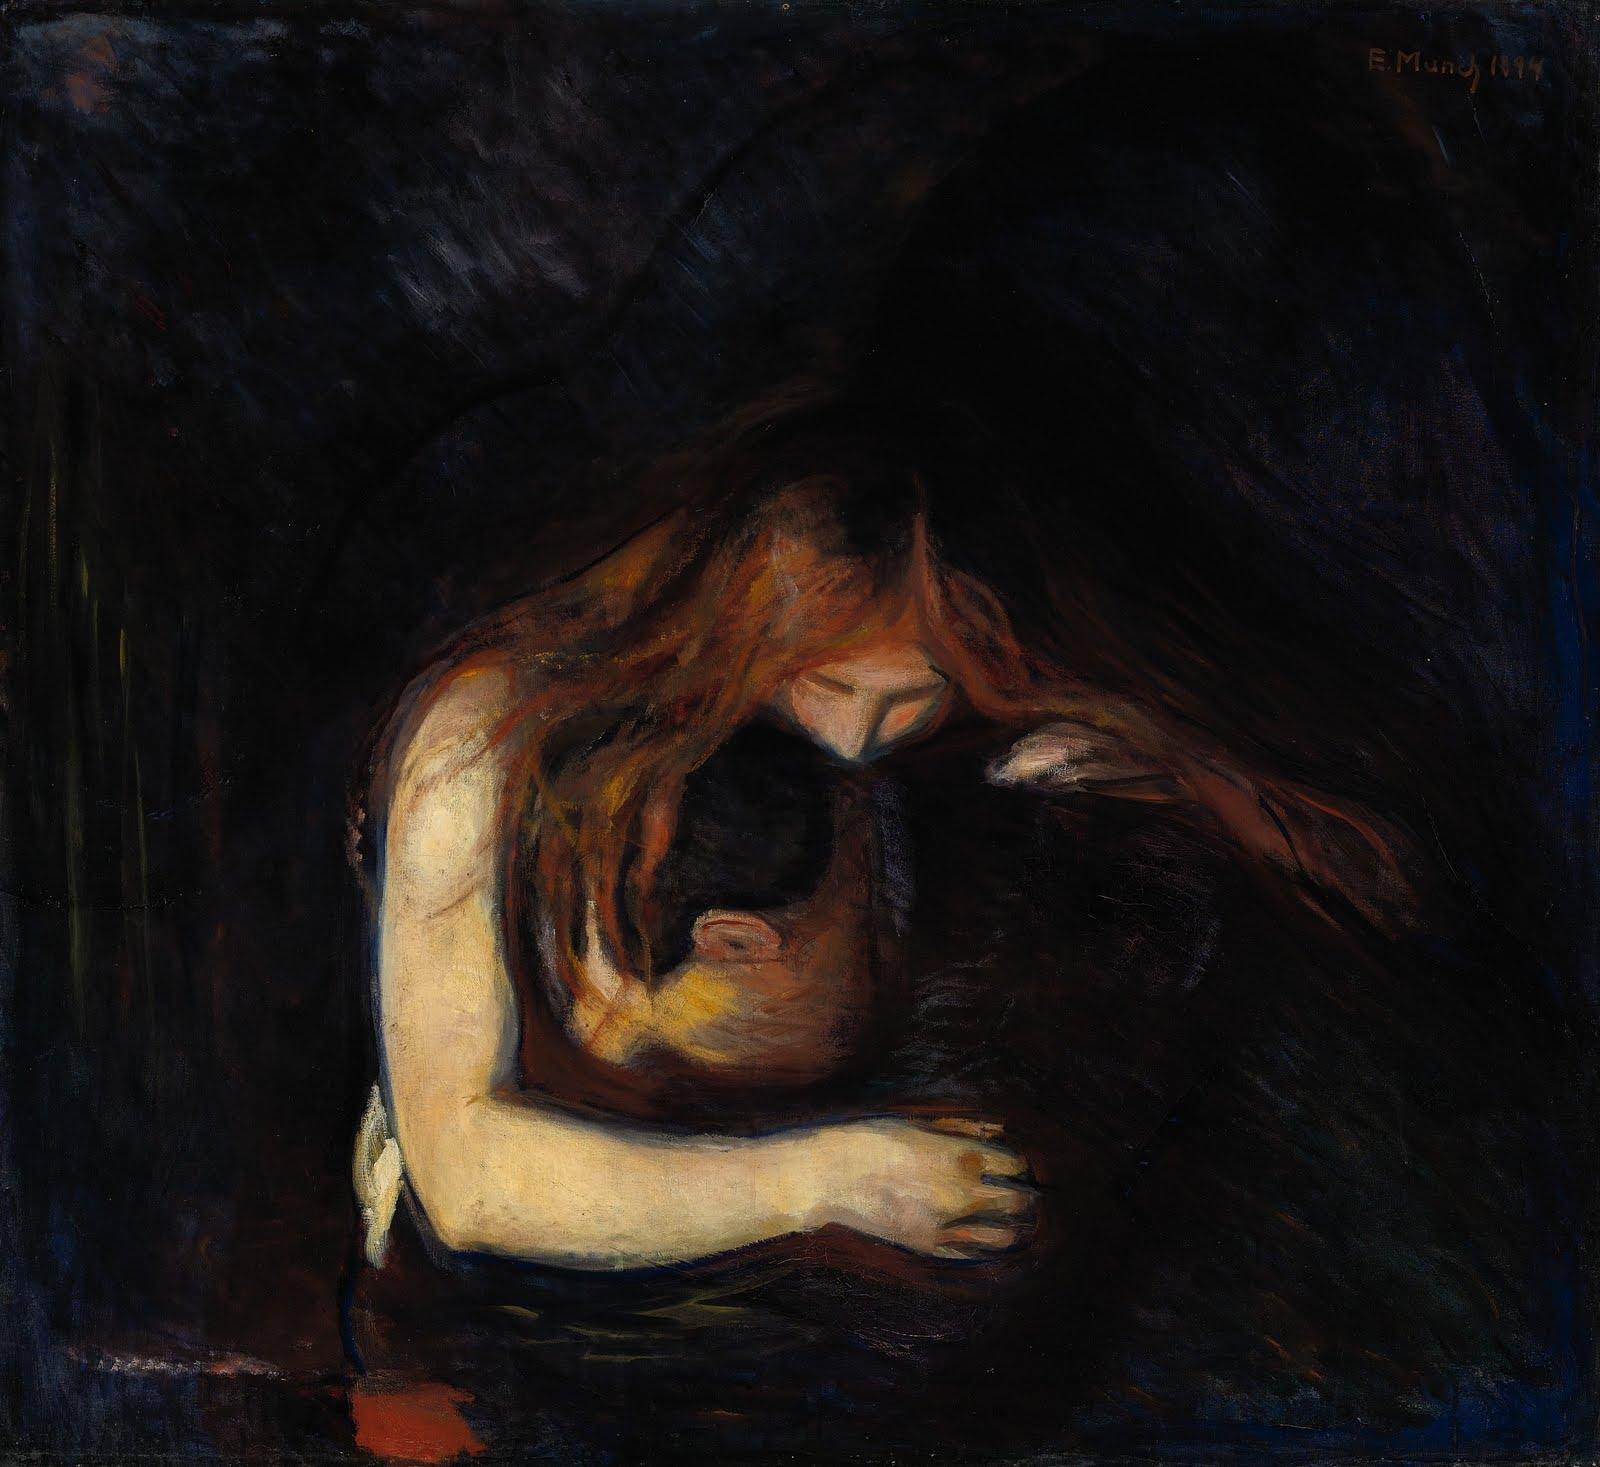 Vampire 1894 Edvard Munch hand-painted oil painting   Vampire Edvard Munch